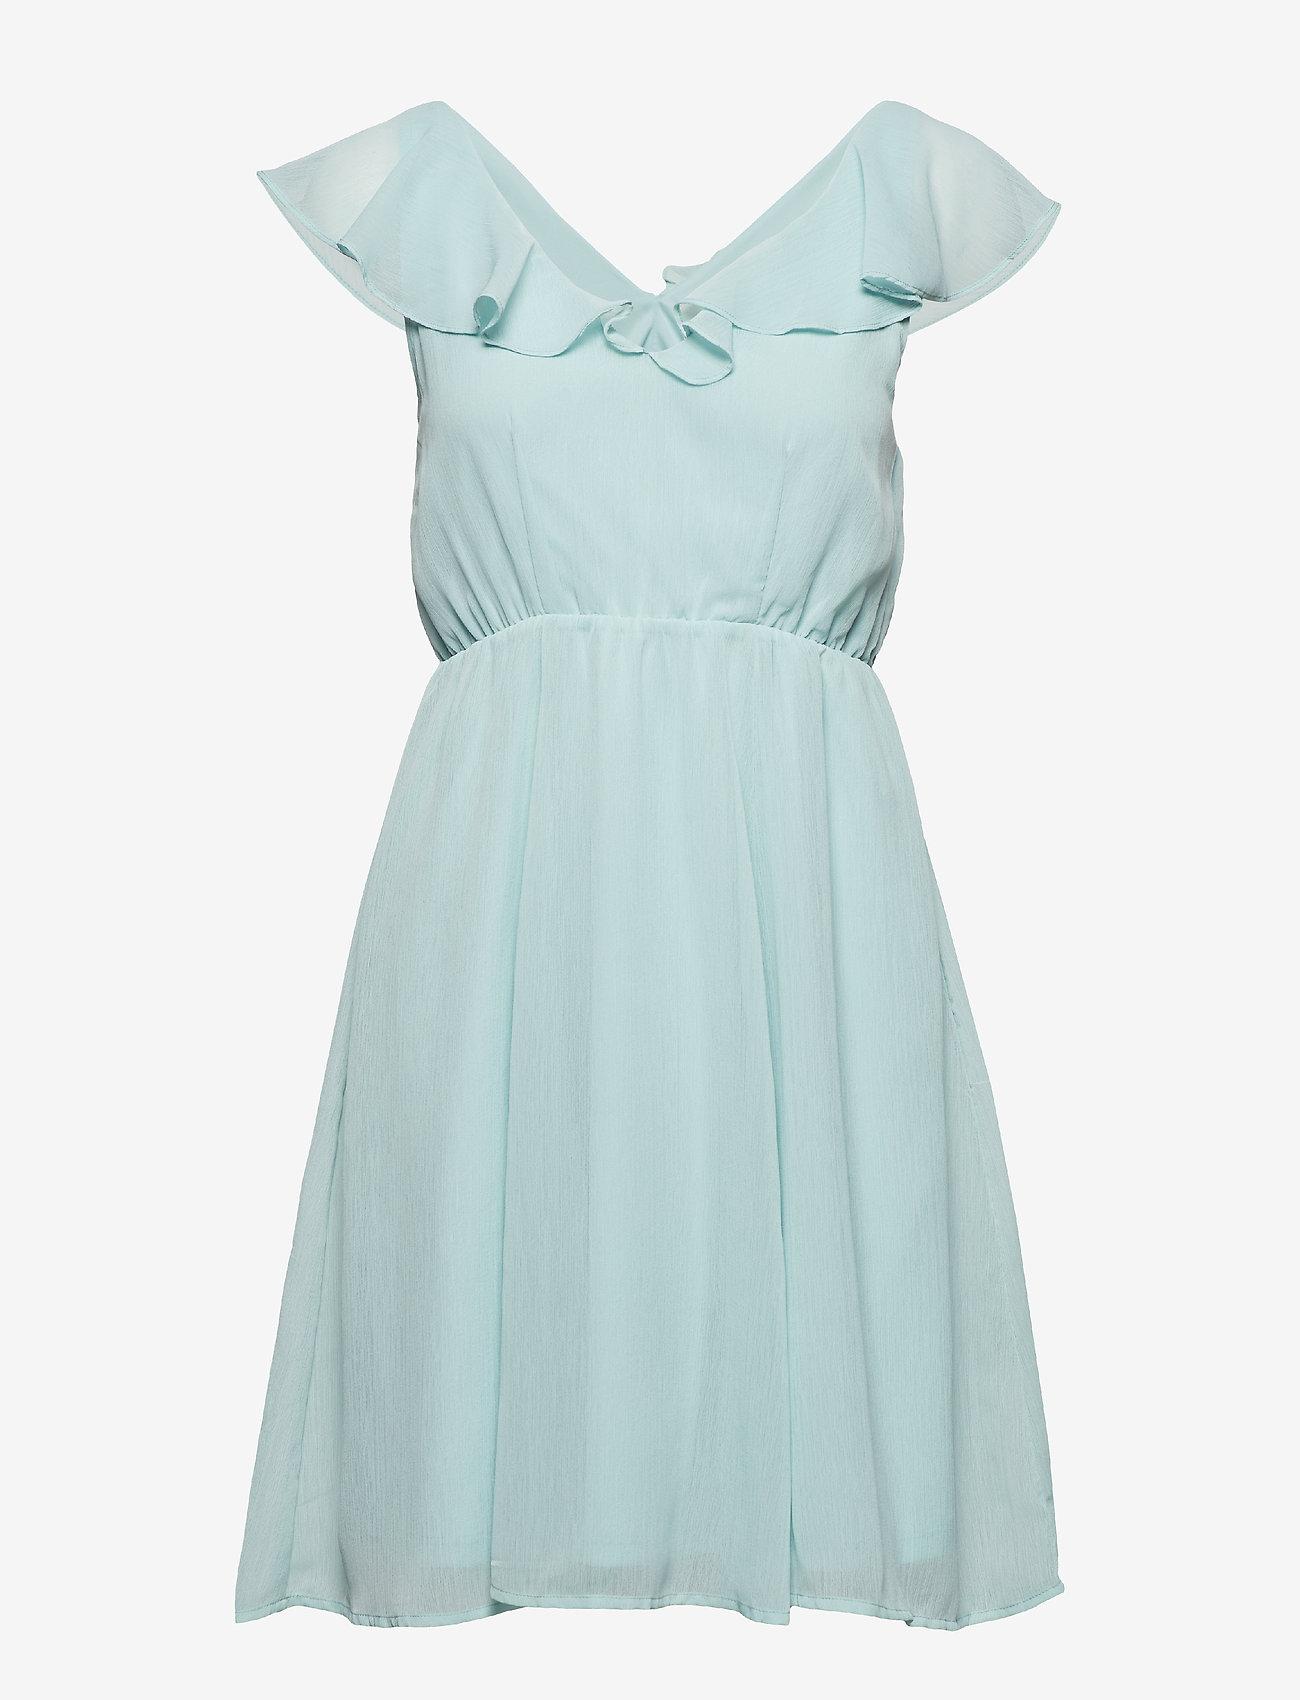 Vila - VIRANNSIL S/L SHORT DRESS/ZA - short dresses - blue haze - 0